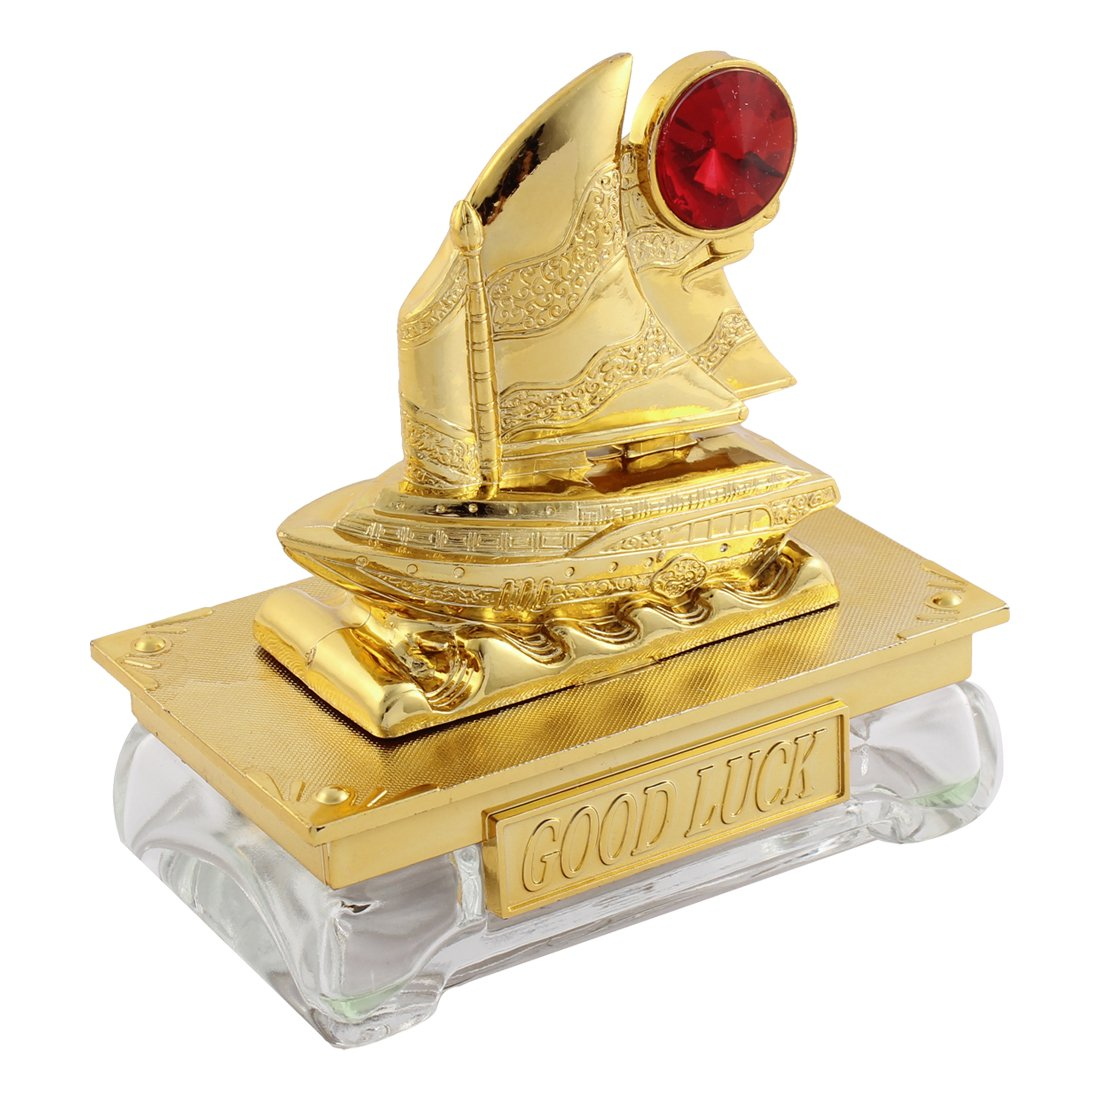 uxcell Auto Freshener Ship Shape Perfume Block Gold Tone